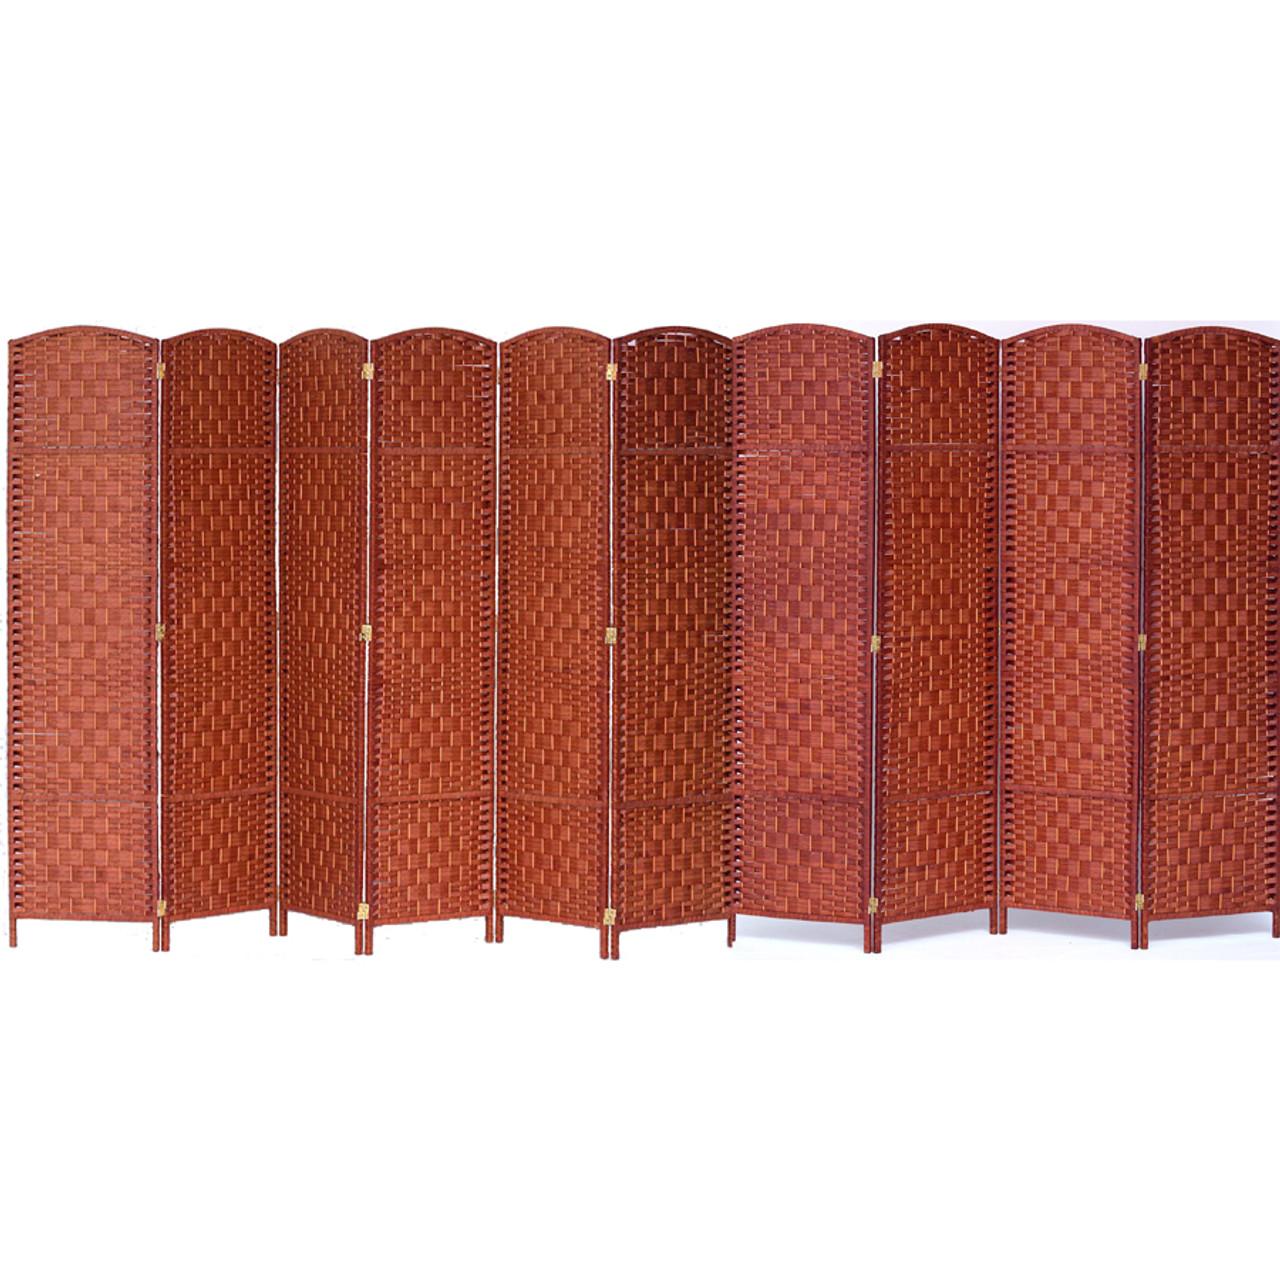 10 Panels Room Divider, Privacy Partition Screen Bamboo Woven Panel in USA, California, New York, NY City, Los Angeles, San Francisco, Pennsylvania, Washington DC, Virginia, Maryland